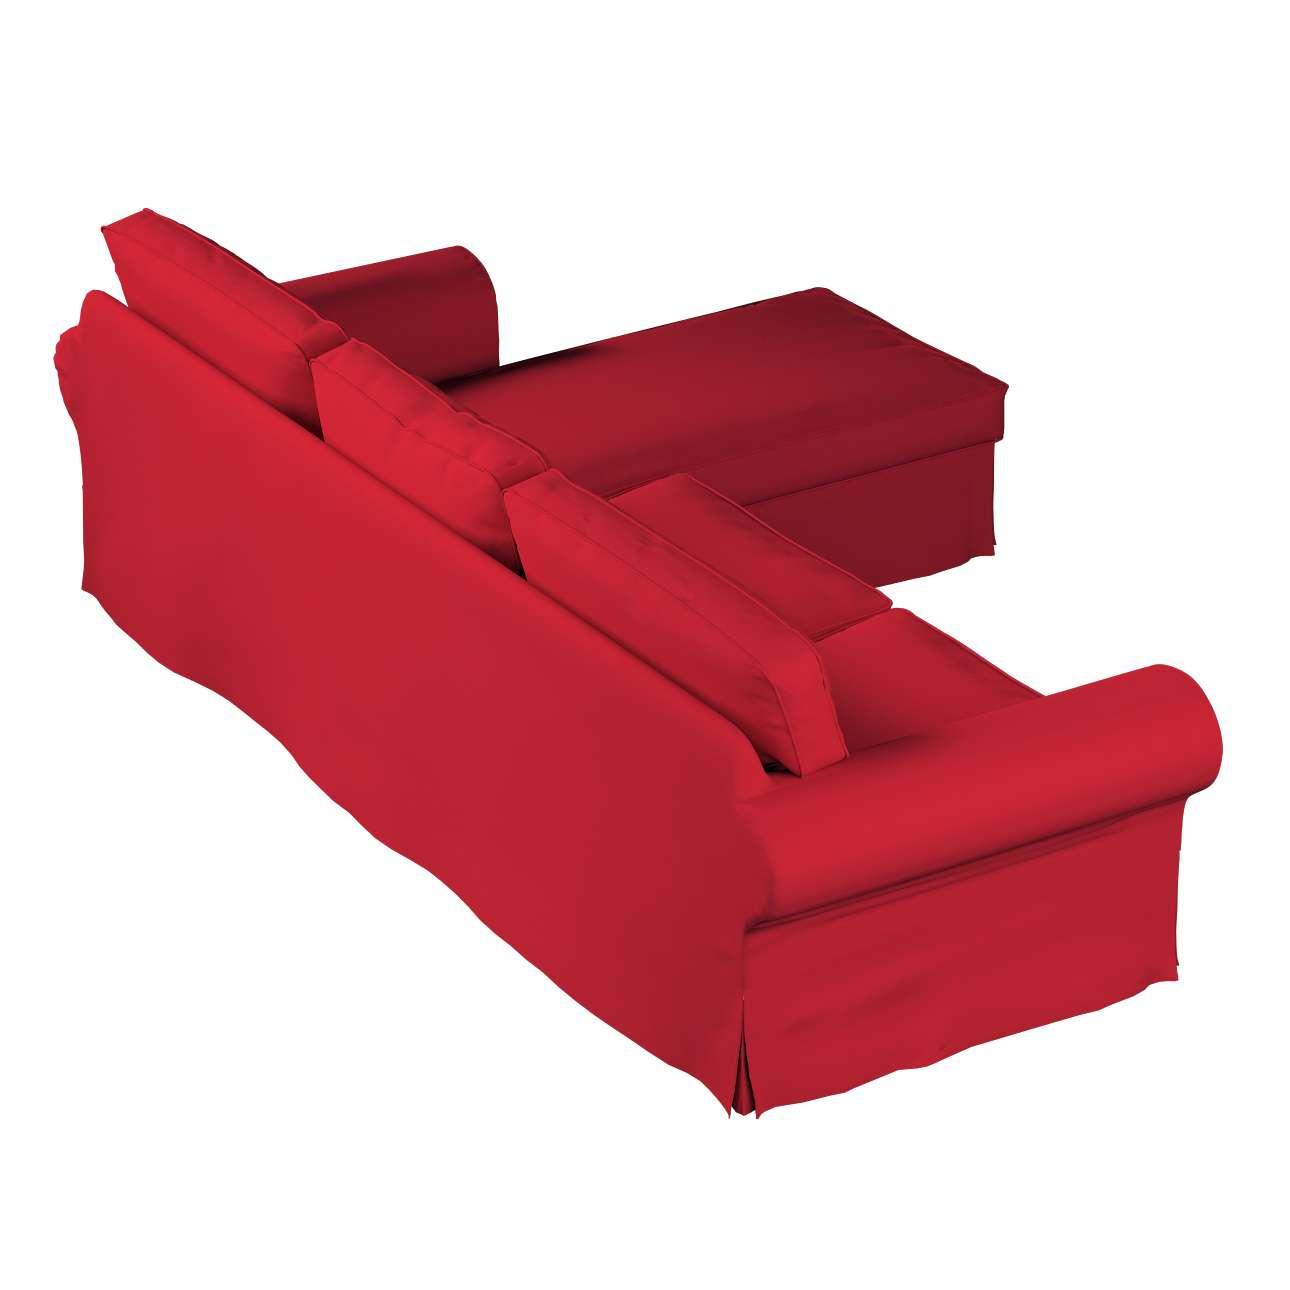 ektorp 2 sitzer sofabezug mit recamiere rot dekoria. Black Bedroom Furniture Sets. Home Design Ideas